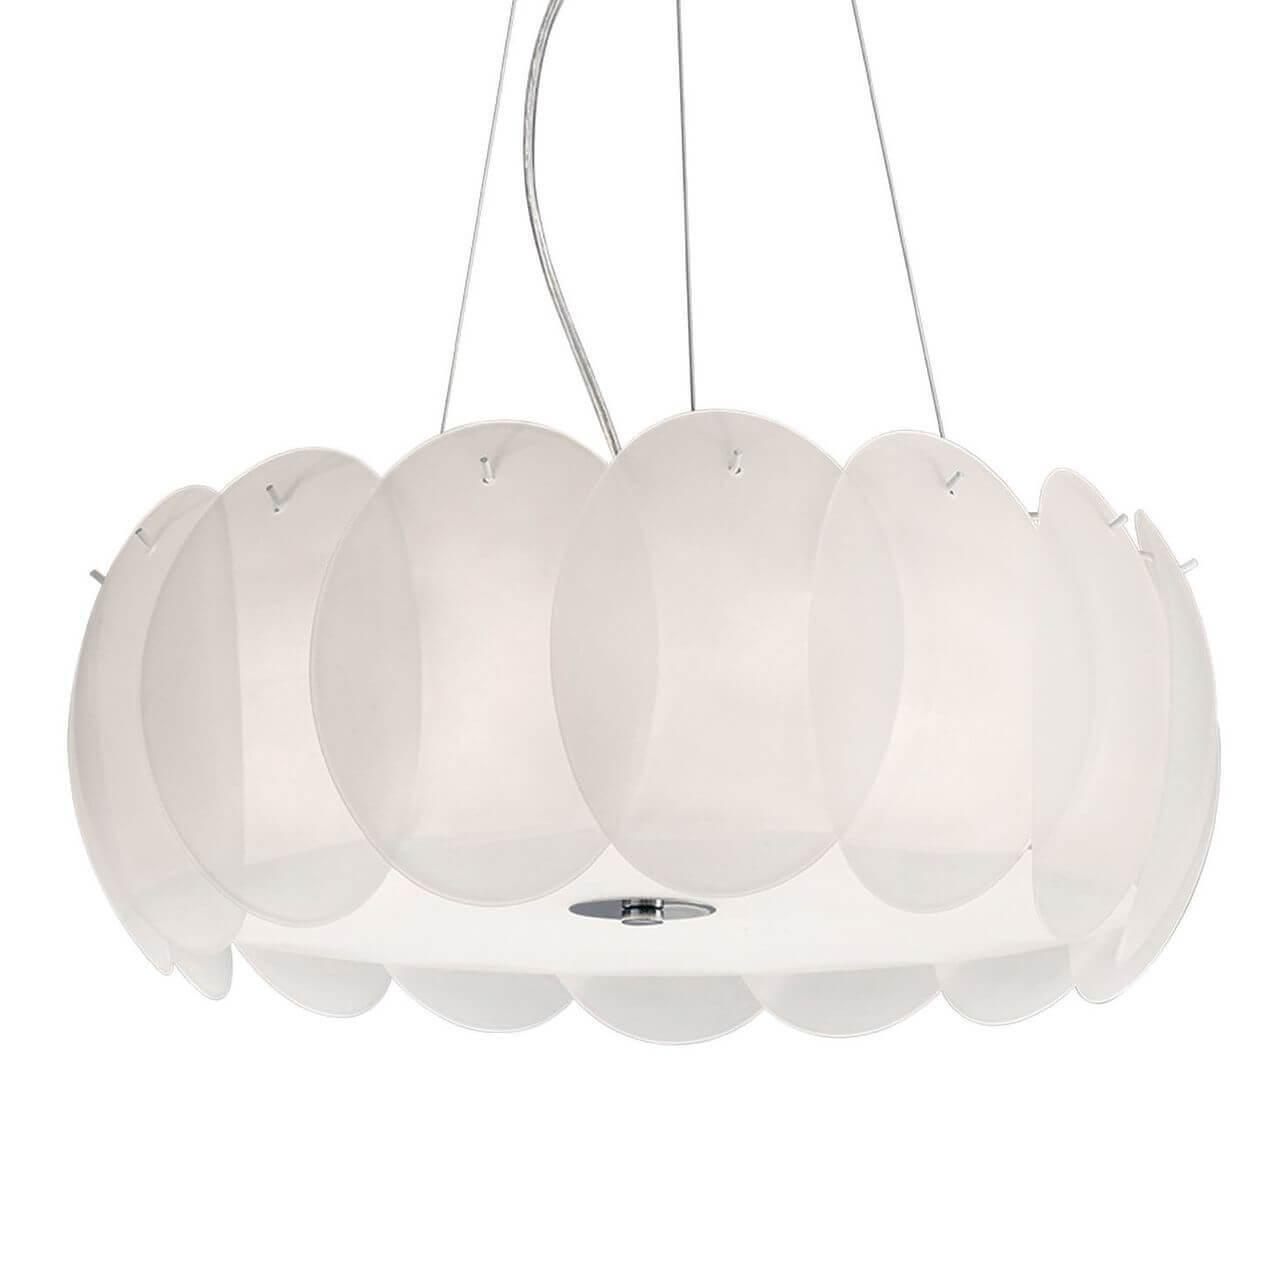 цена на Светильник Ideal Lux Ovalino SP8 Ovalino Bianco